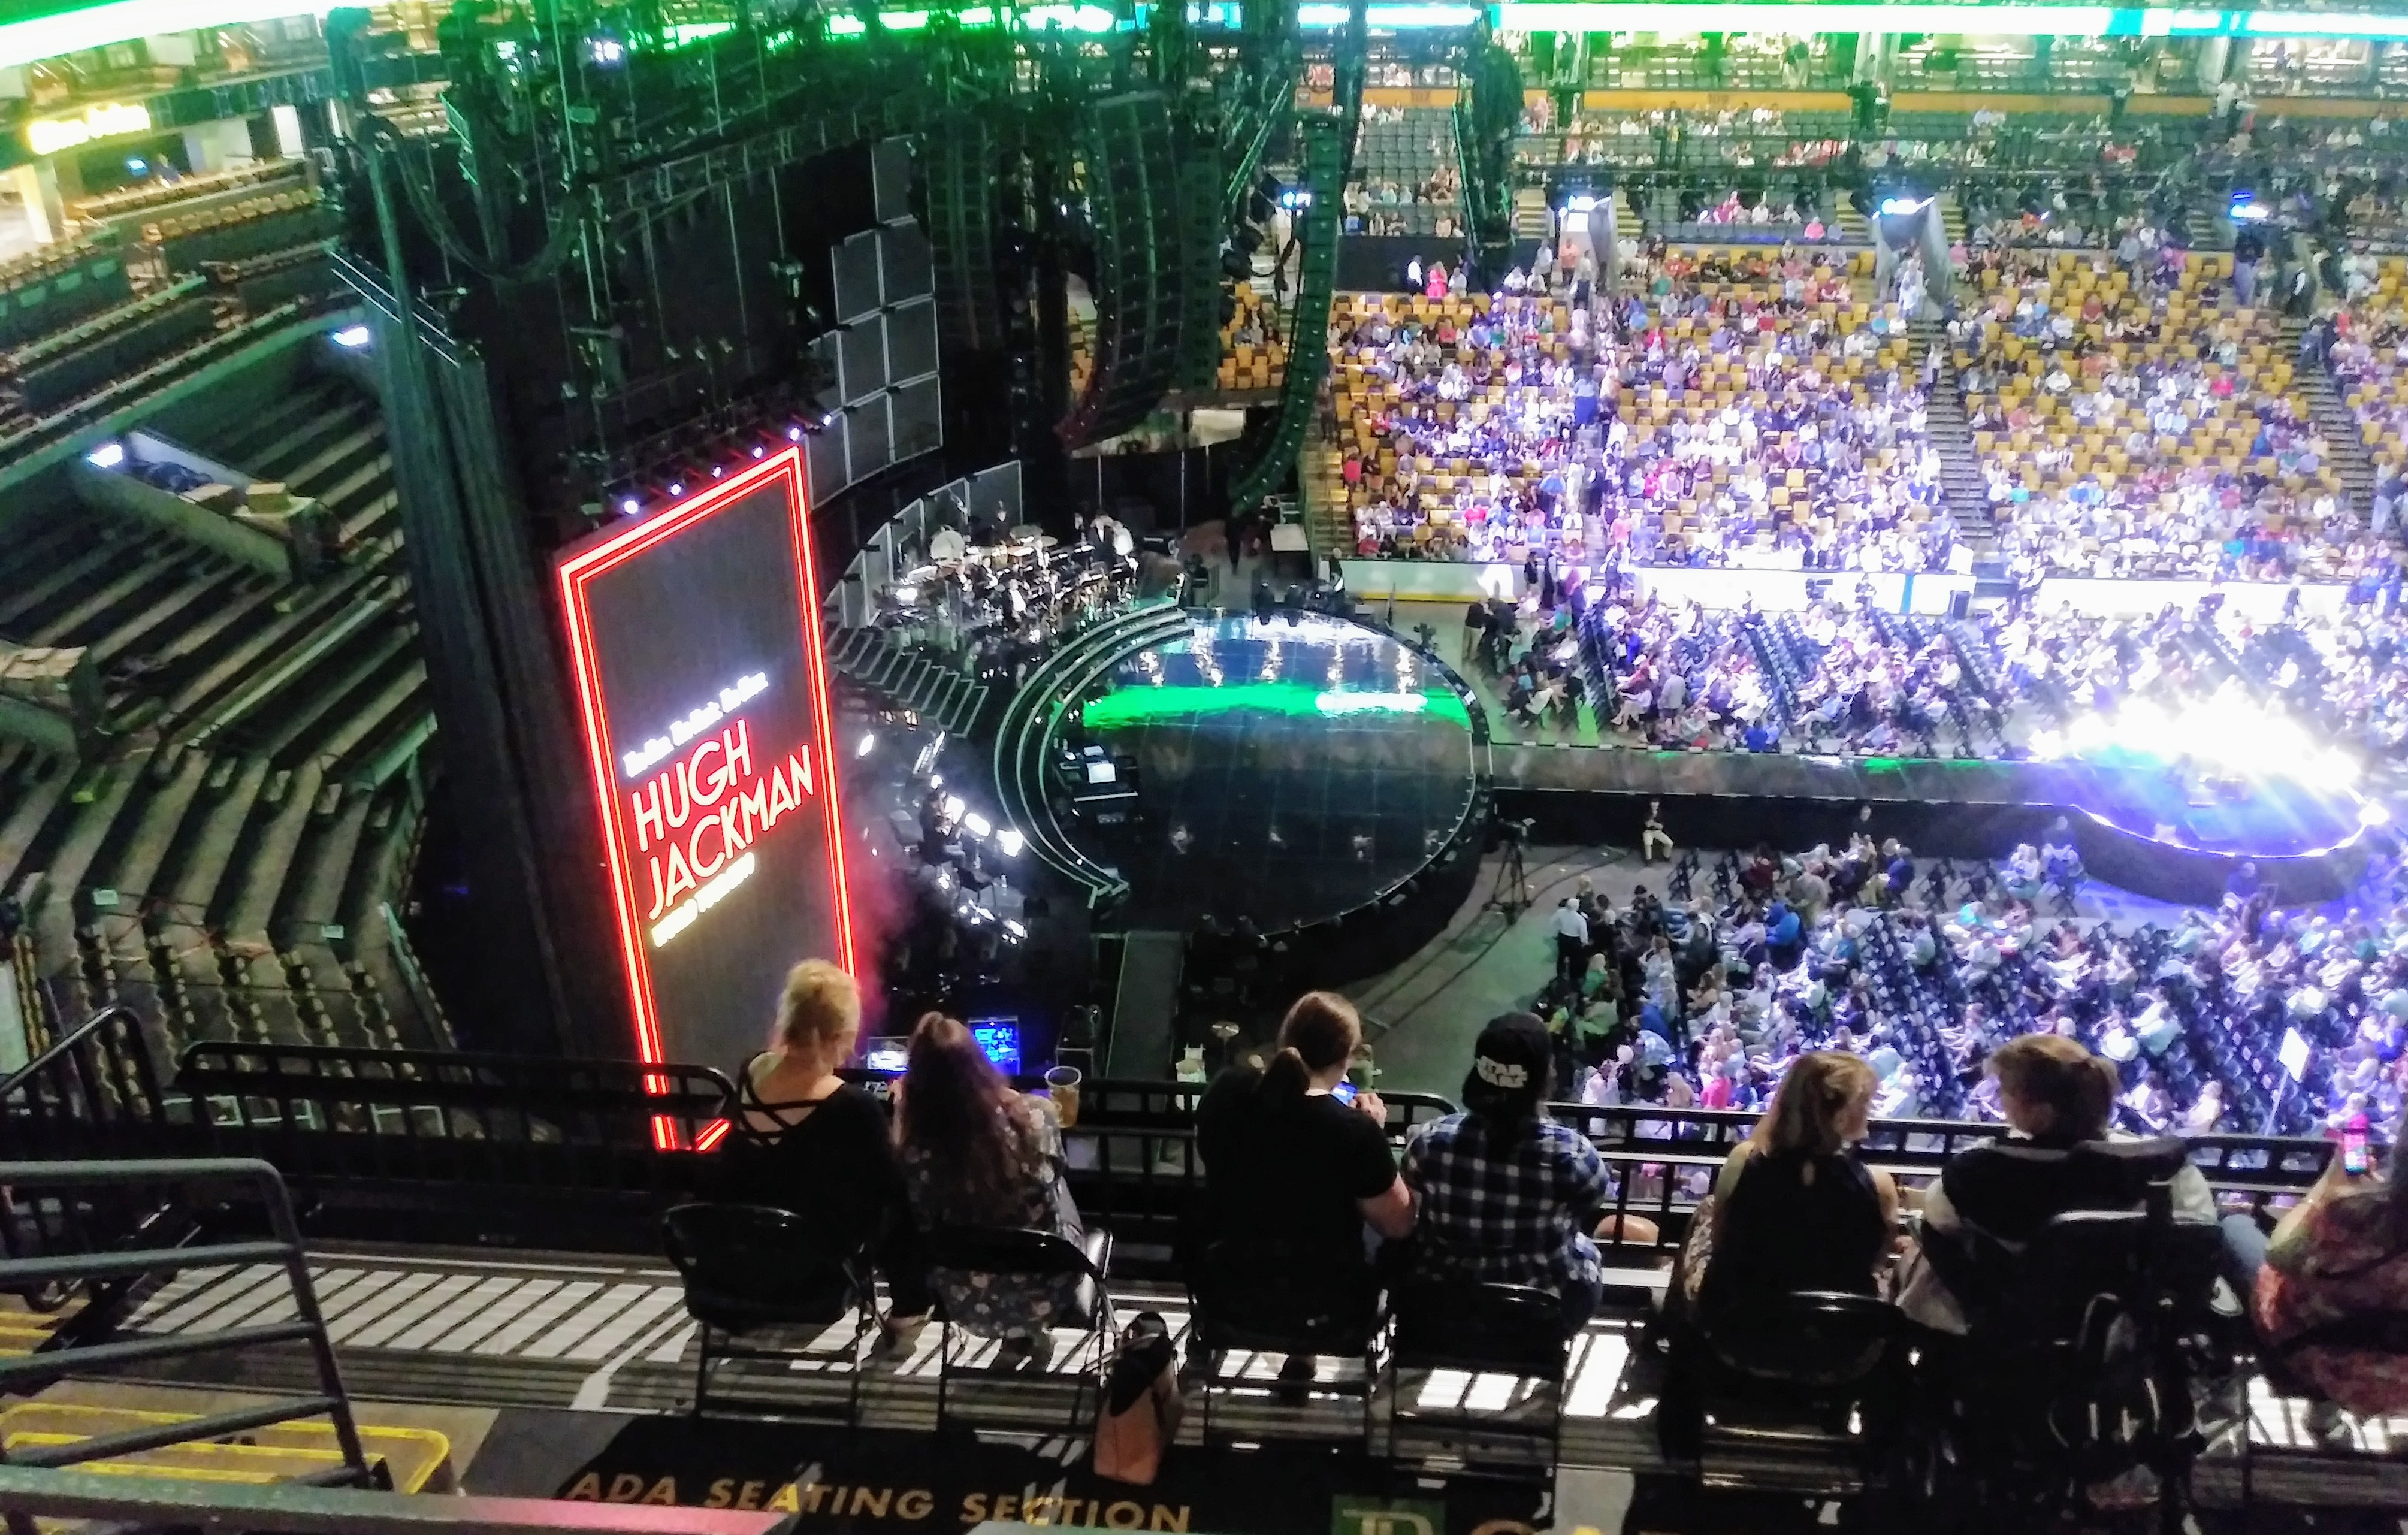 Hugh Jackman stage